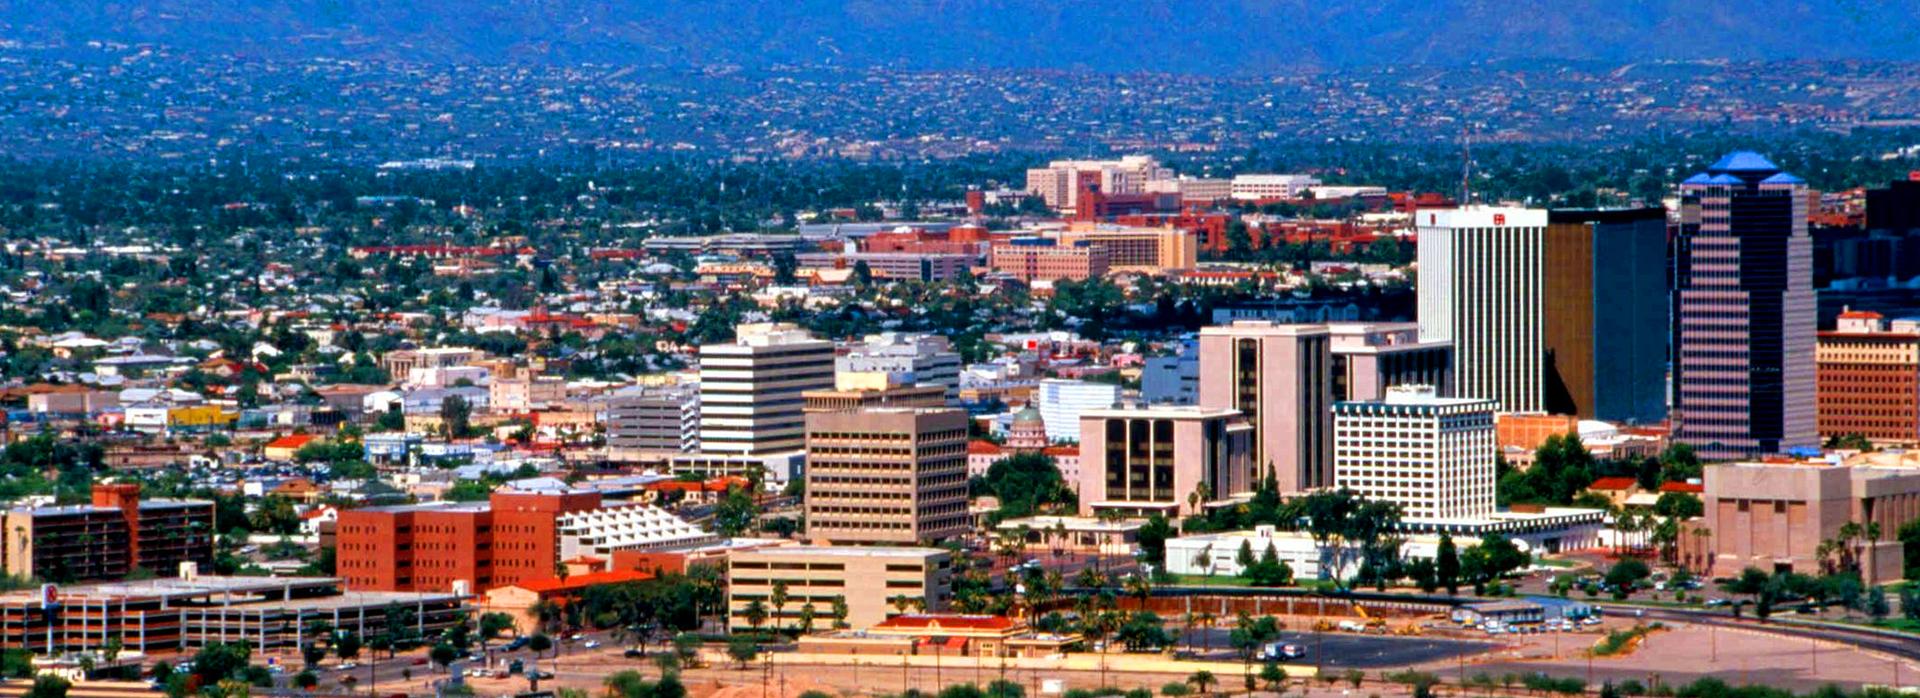 Catalina's and Tucson